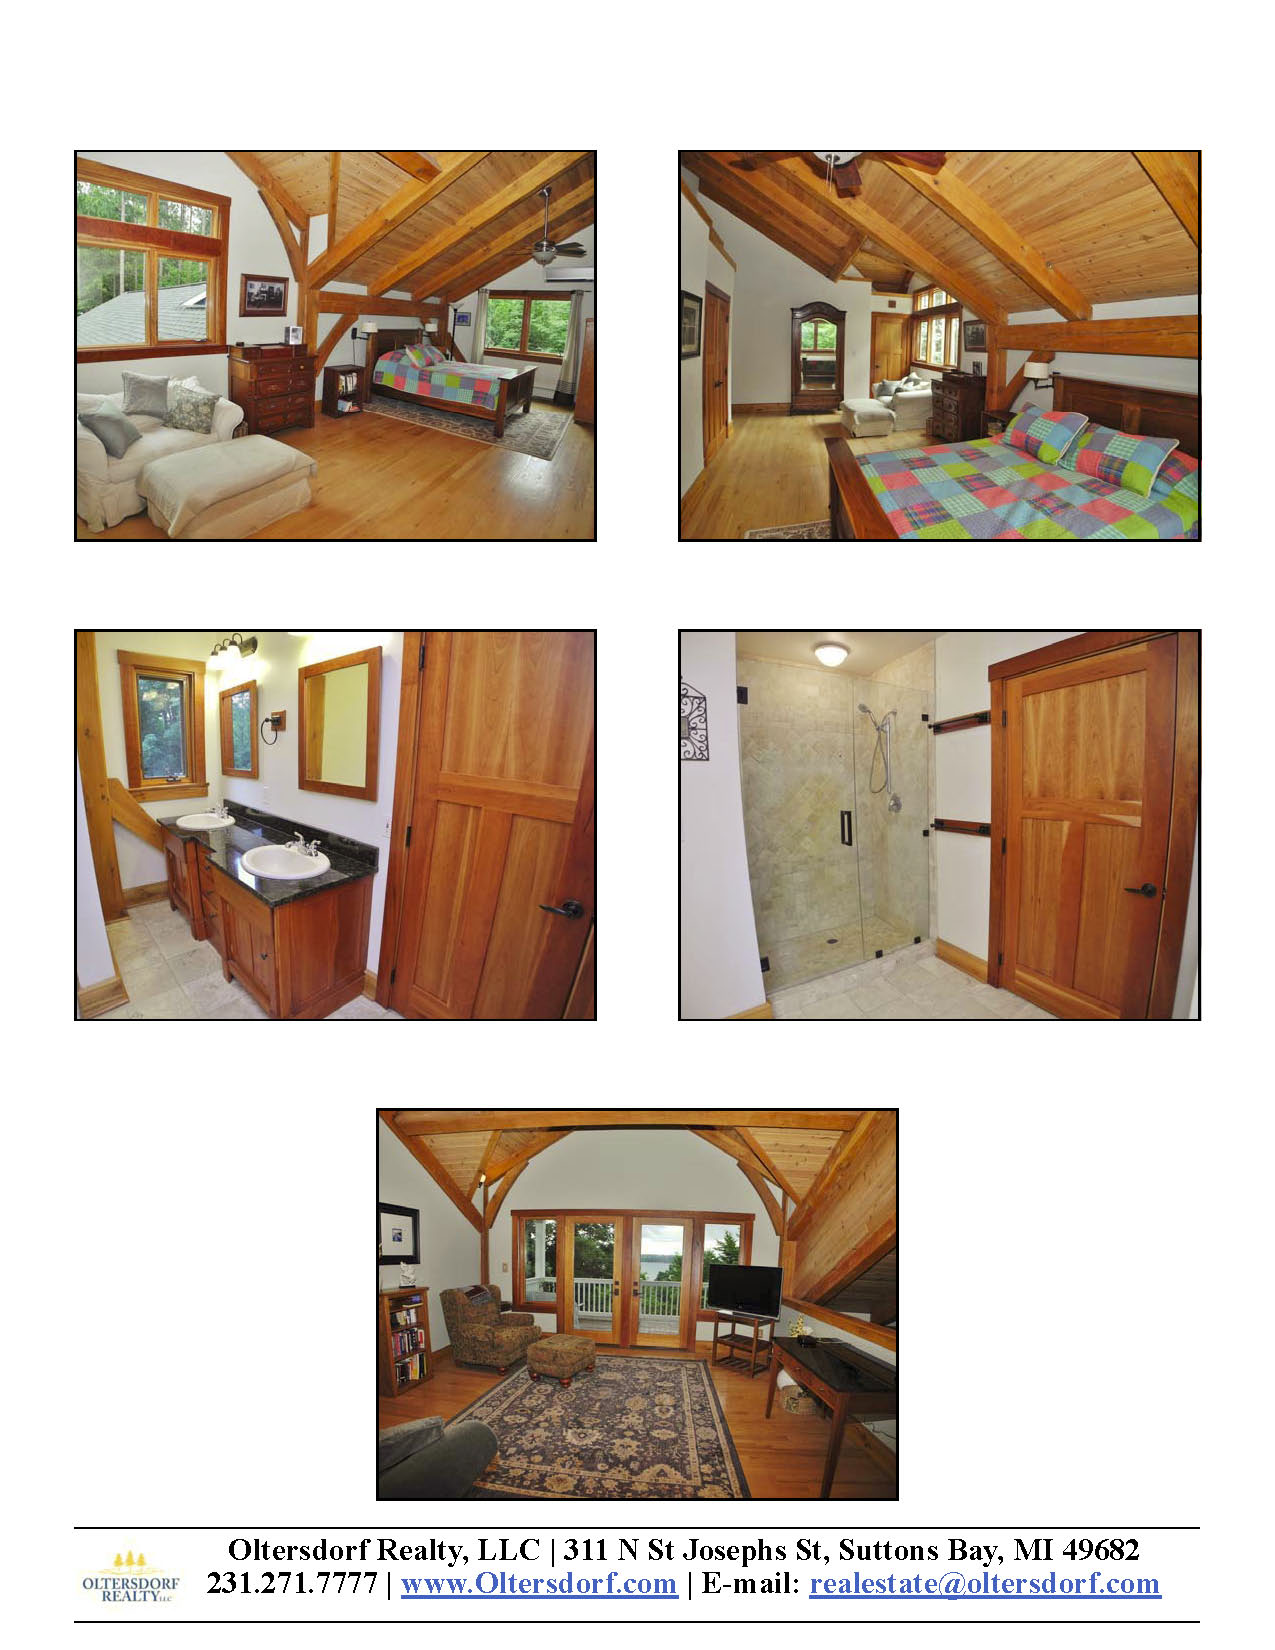 5500 E Hidden Beech, Cedar, MI - For sale by Oltersdorf Realty LLC - Marketing Packet (7).jpg